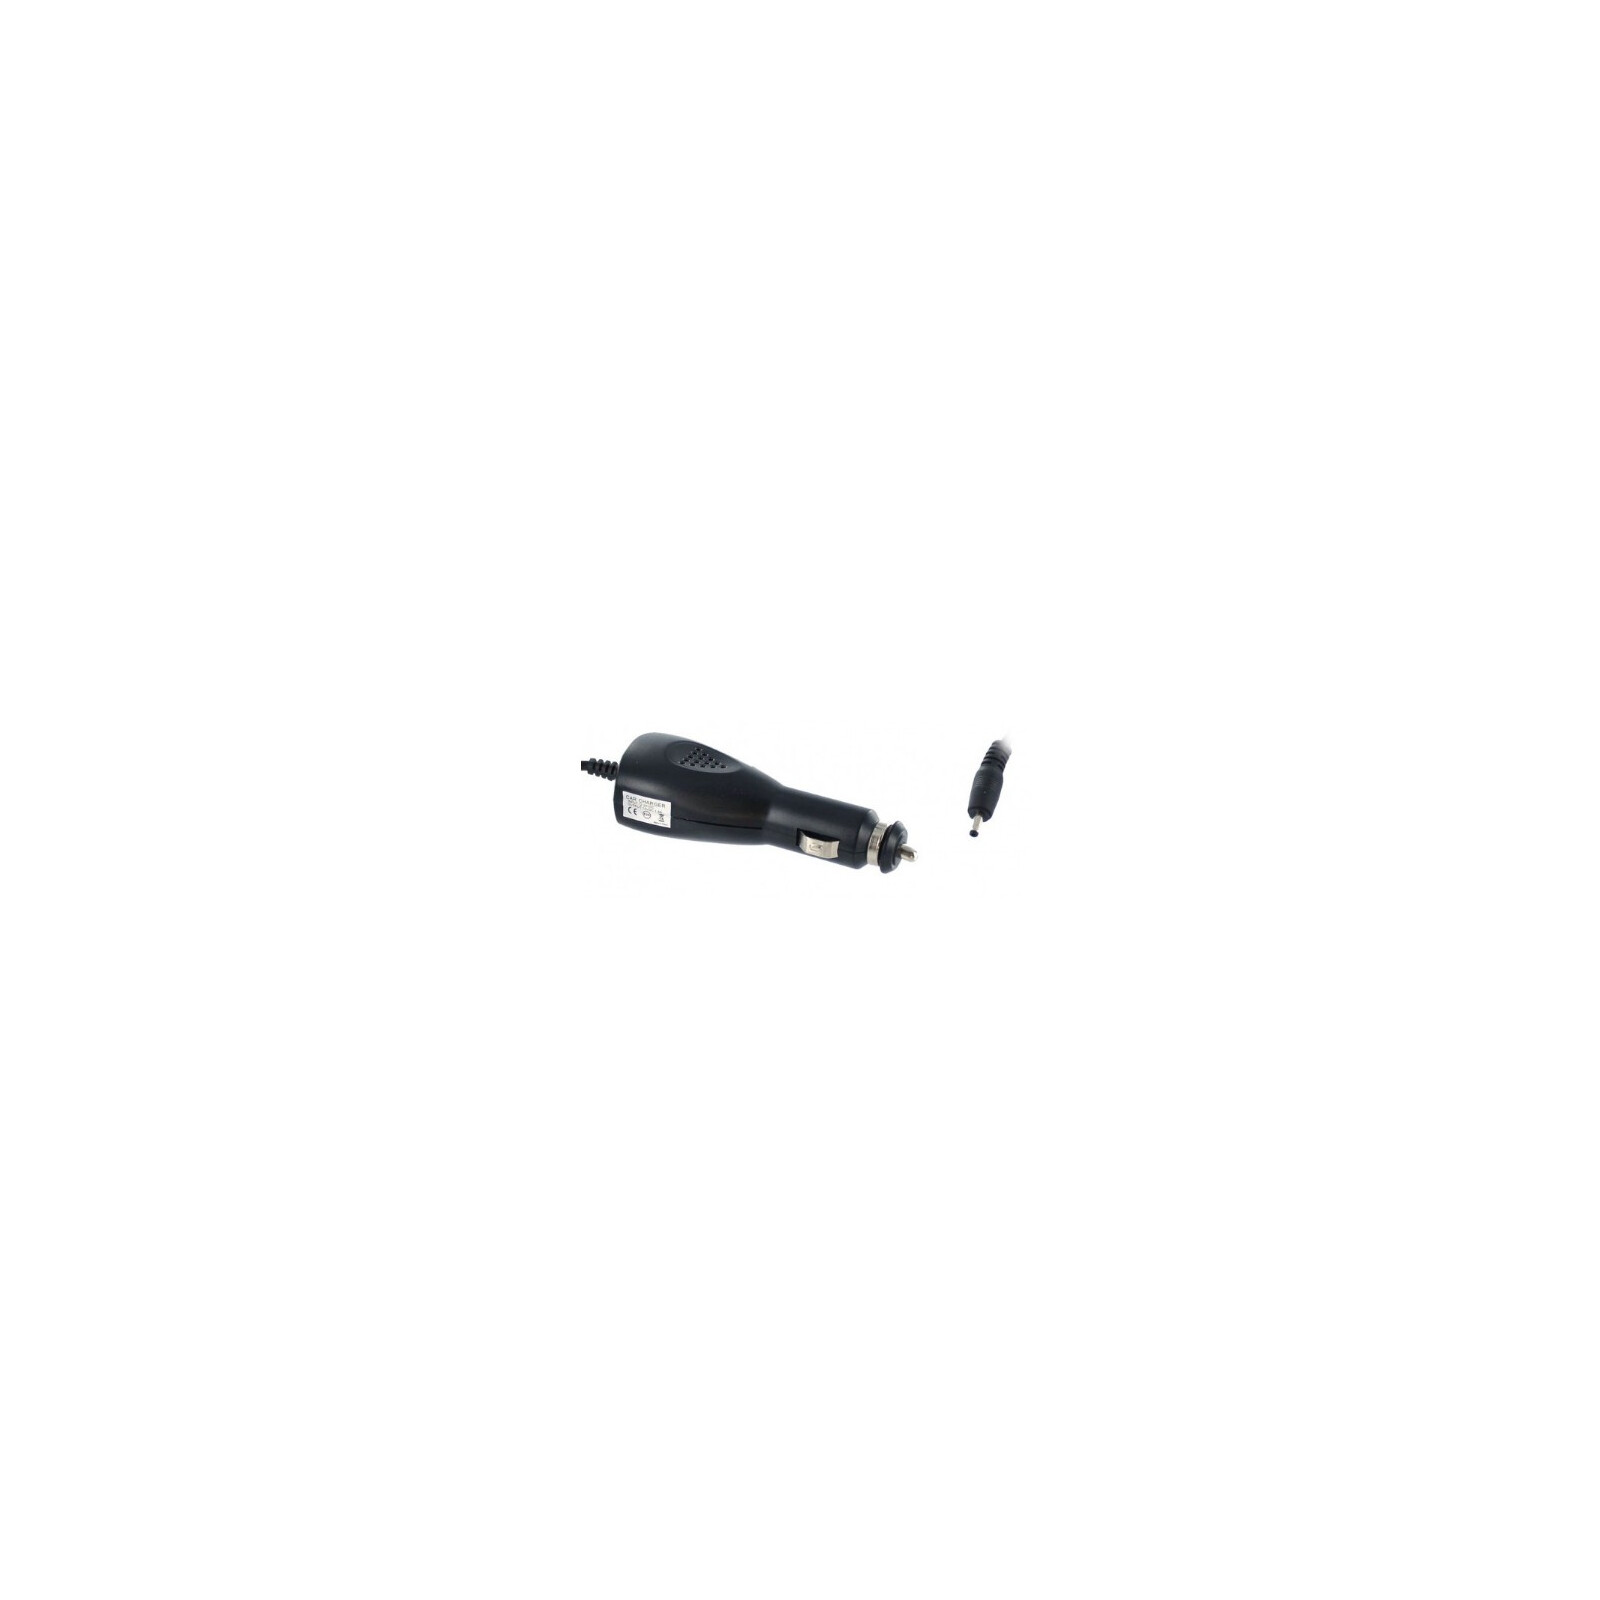 AGI Kfz-Ladekabel Acer Iconia Tab A501 18W